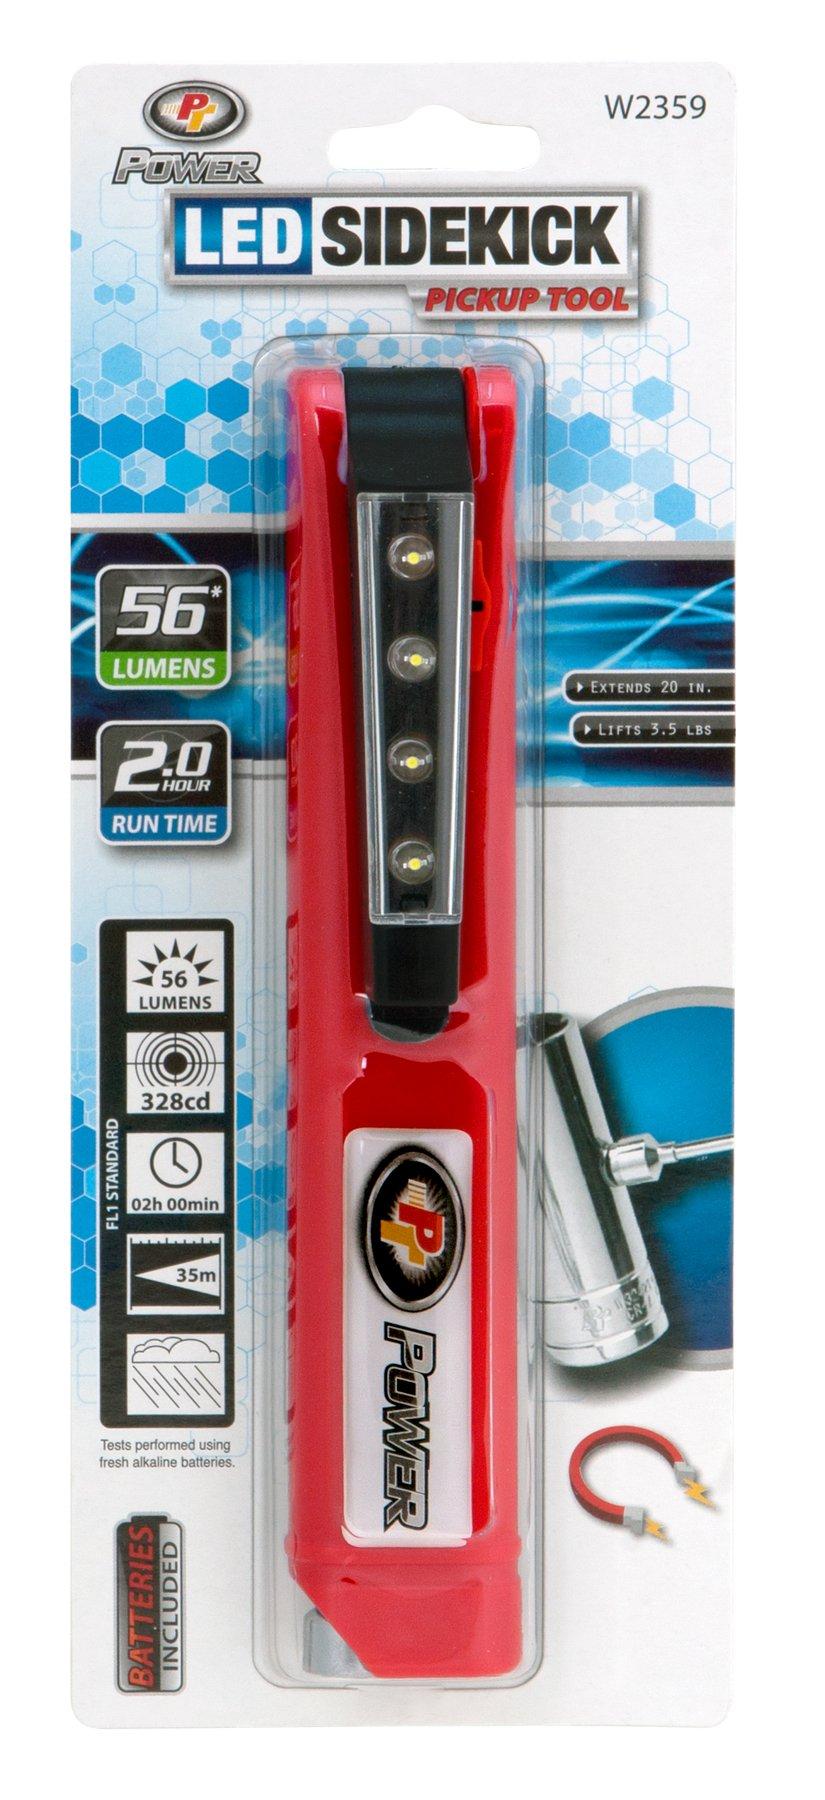 Performance Tool W2359 56 Lumen LED Sidekick Pickup Tool (Sold as 1 Flashlight)